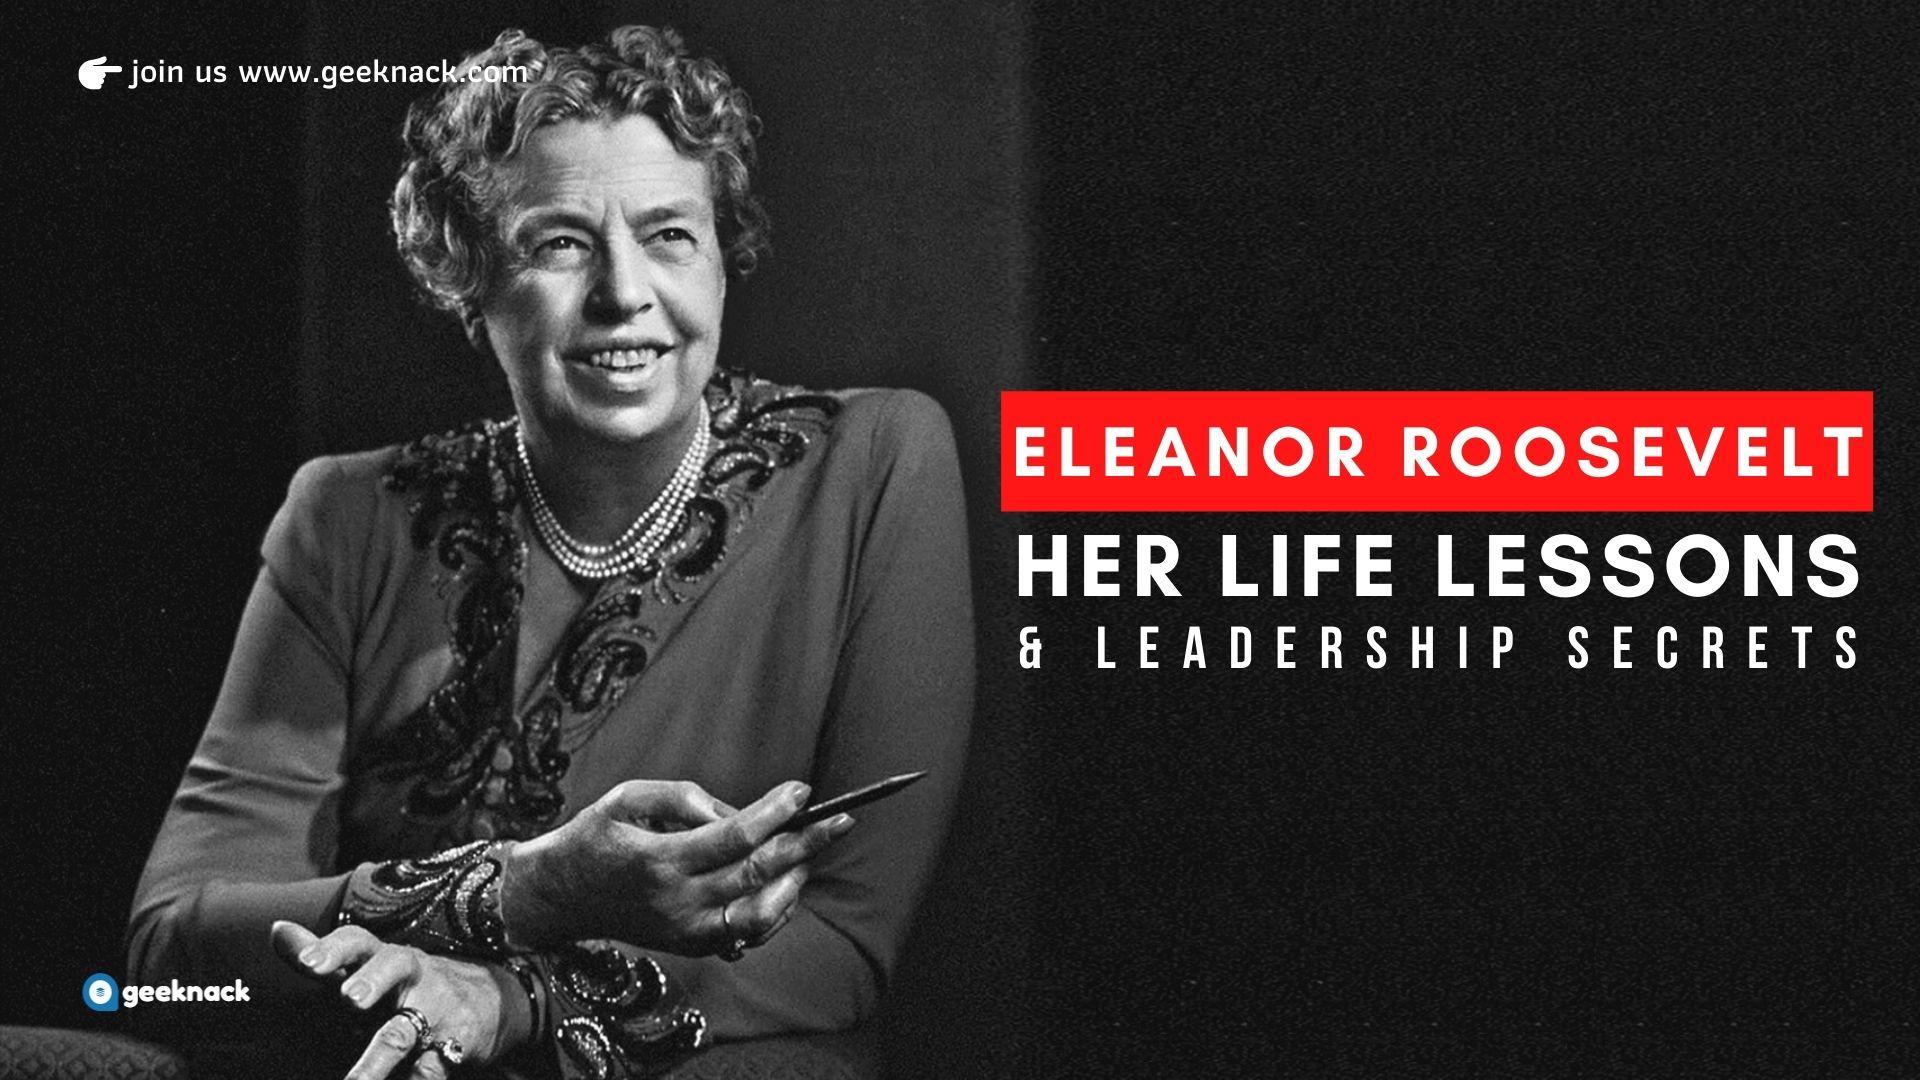 Eleanor Roosevelt - Her Life Lessons & Leadership Secrets